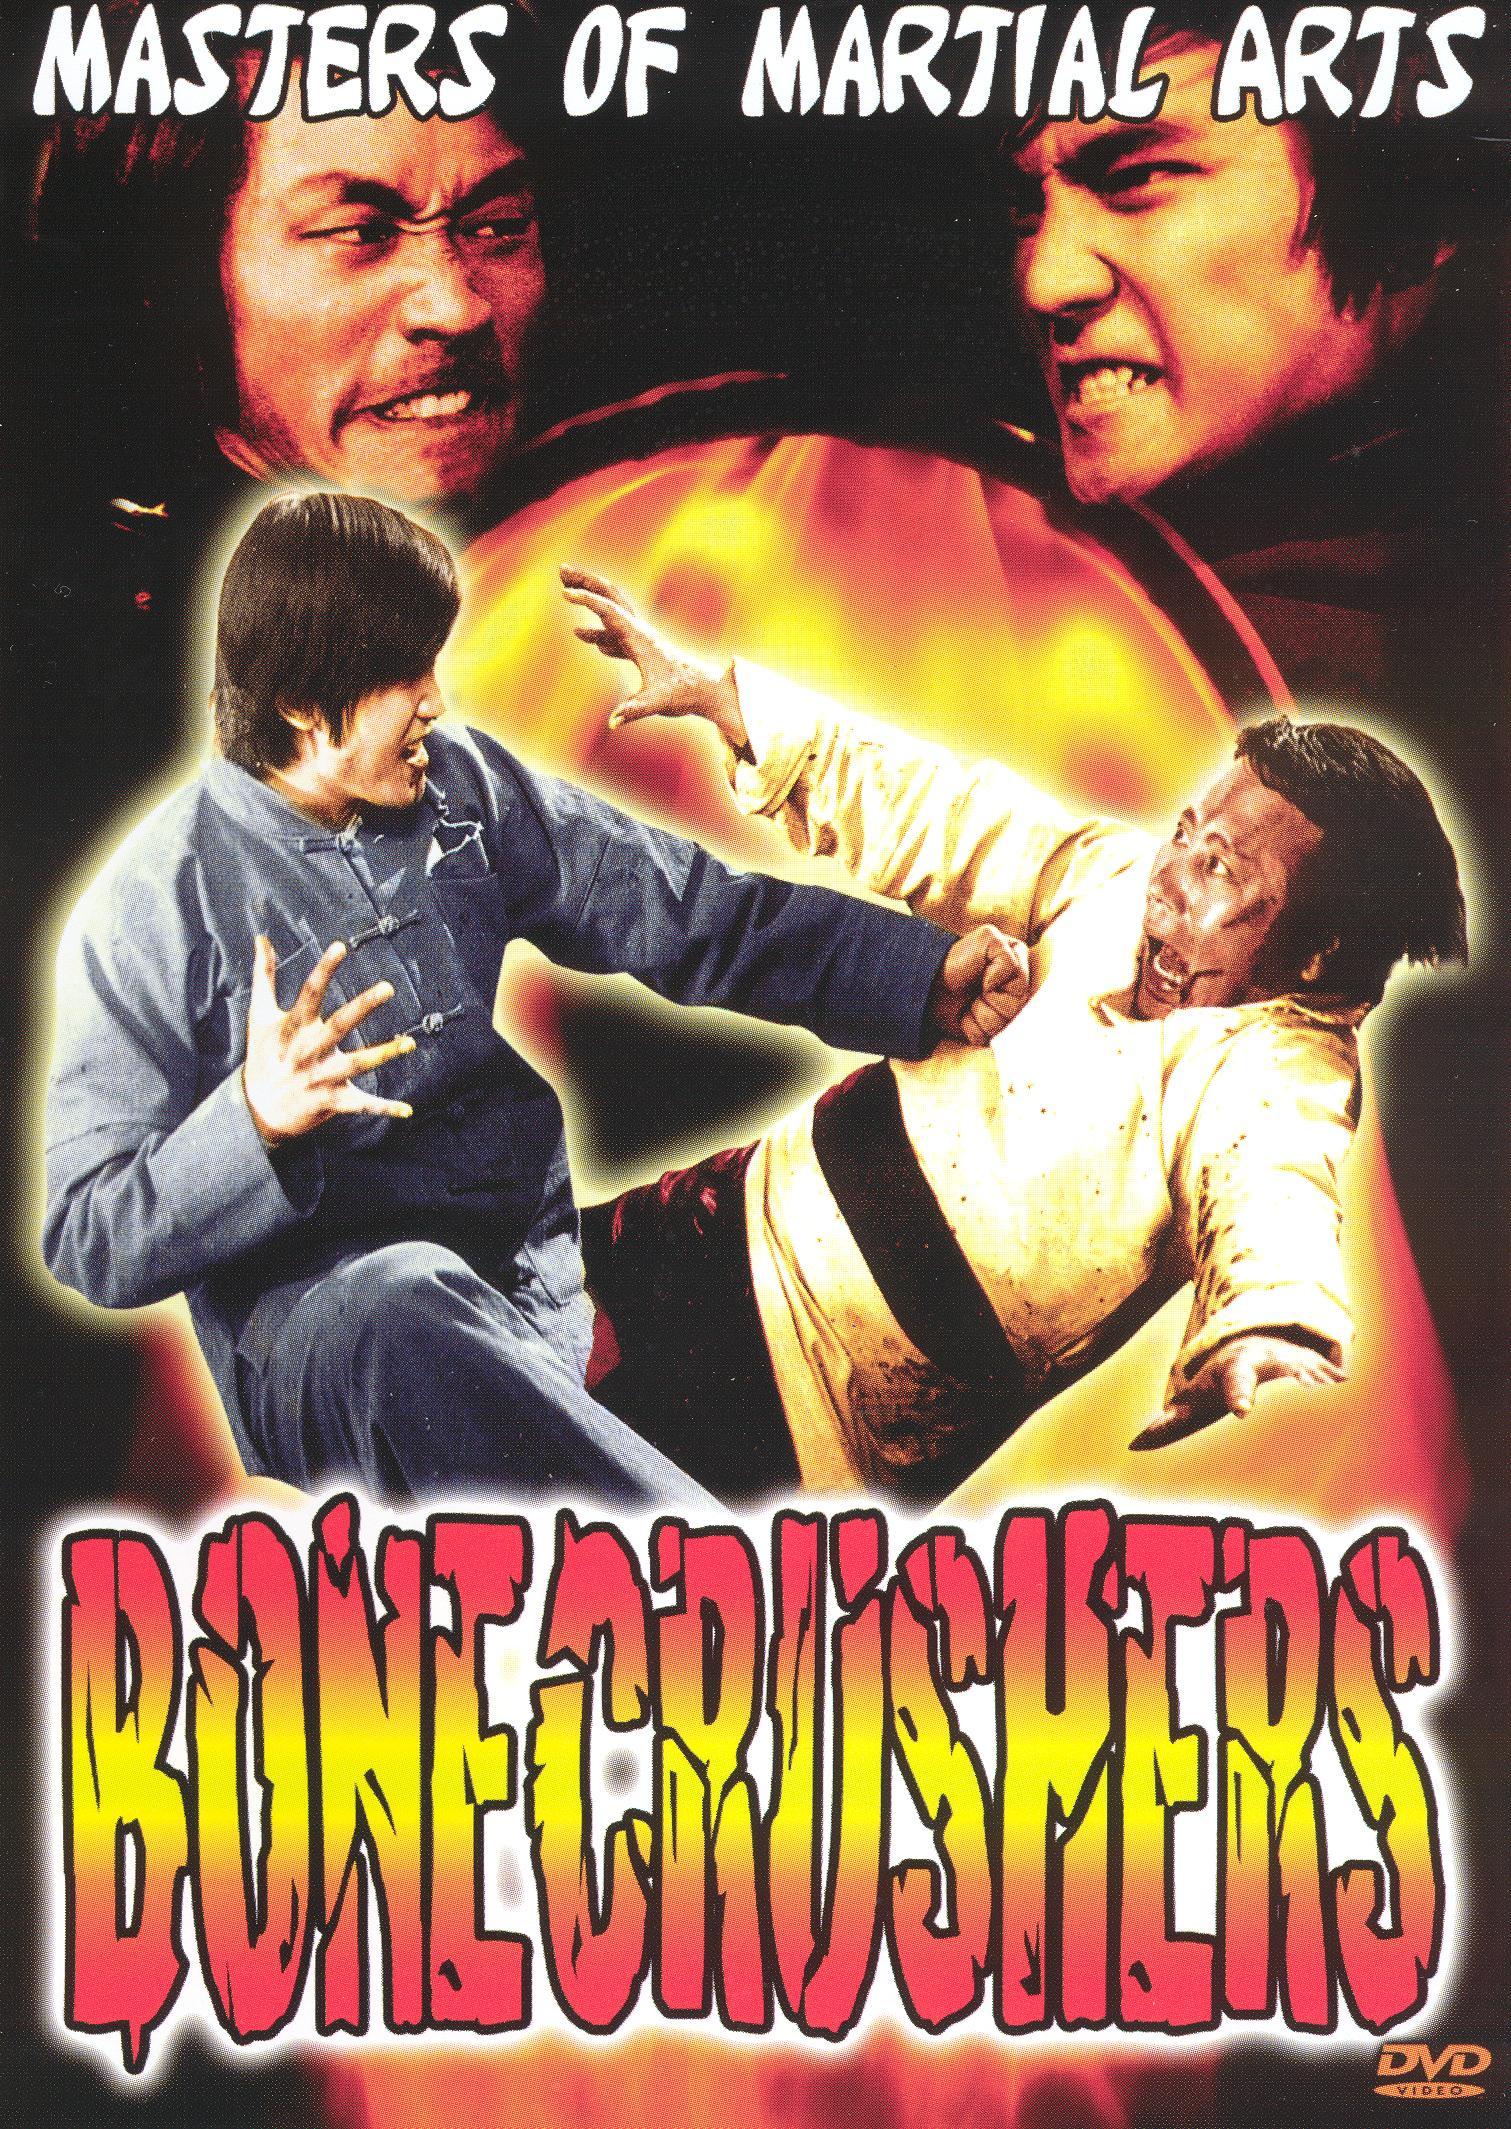 Masters of Martial Arts: Bone Crushers